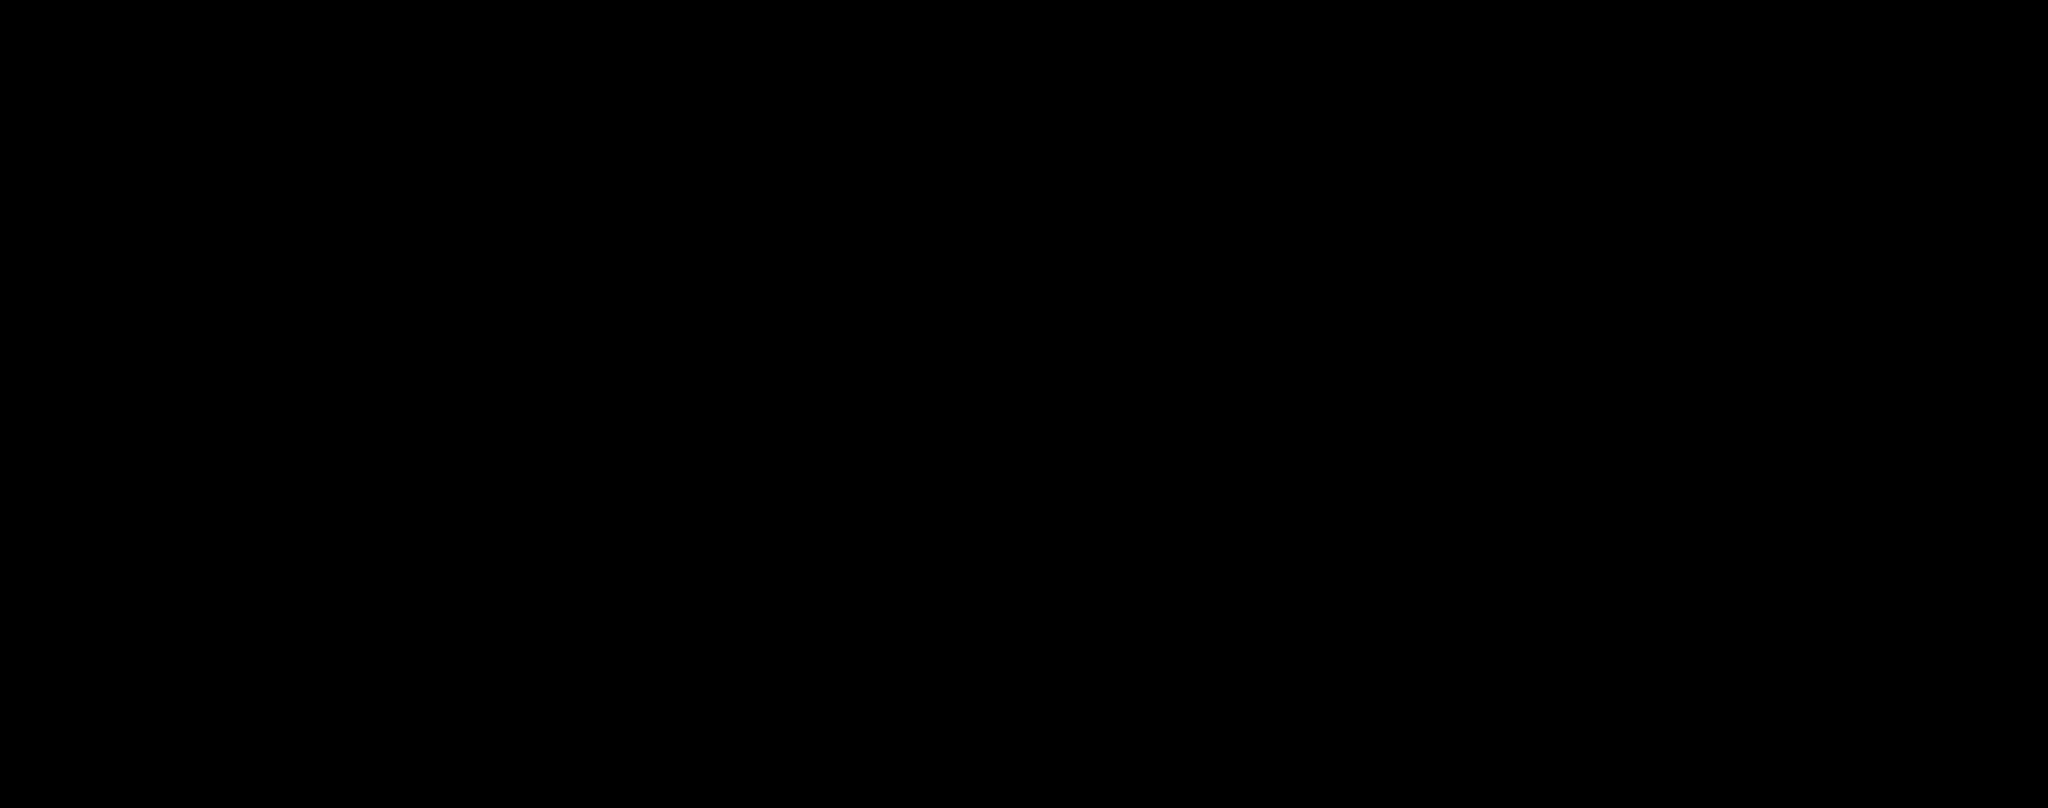 Isoferulic acid 3-O-β-D-glucuronide